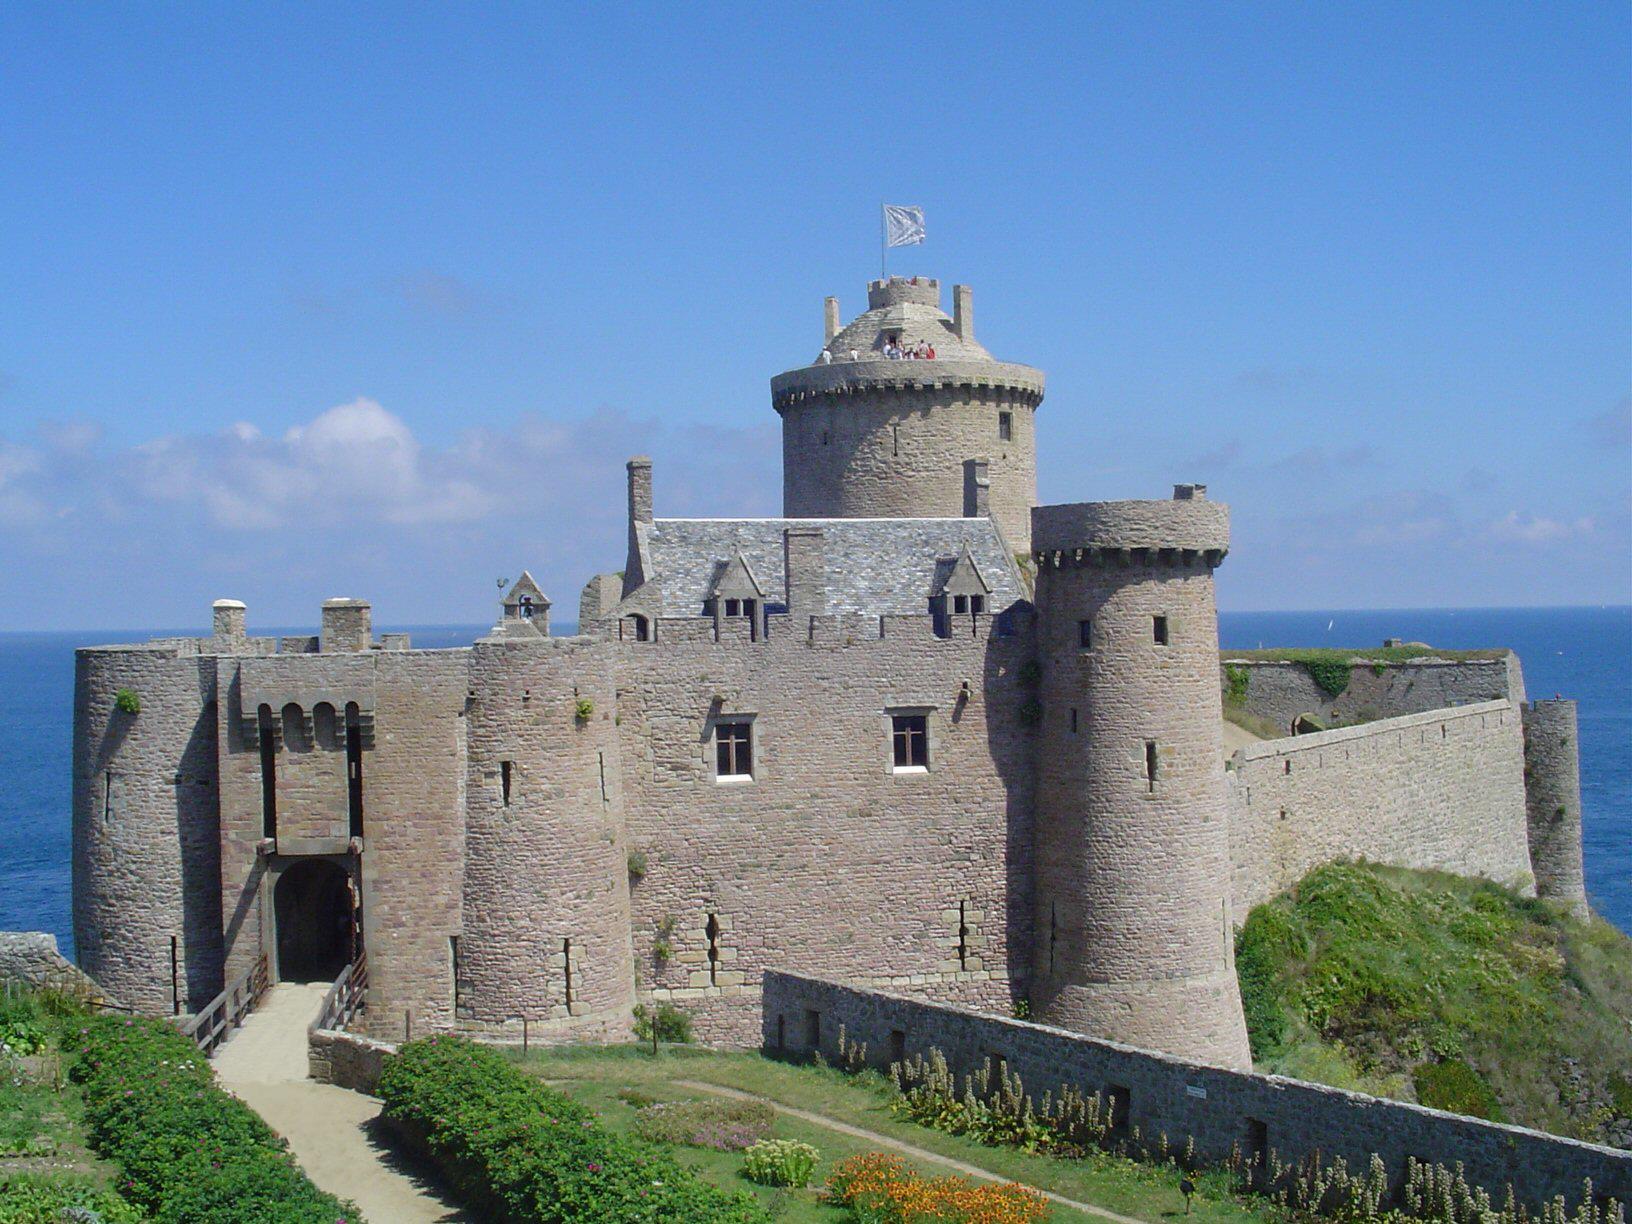 Castles Europe Tour